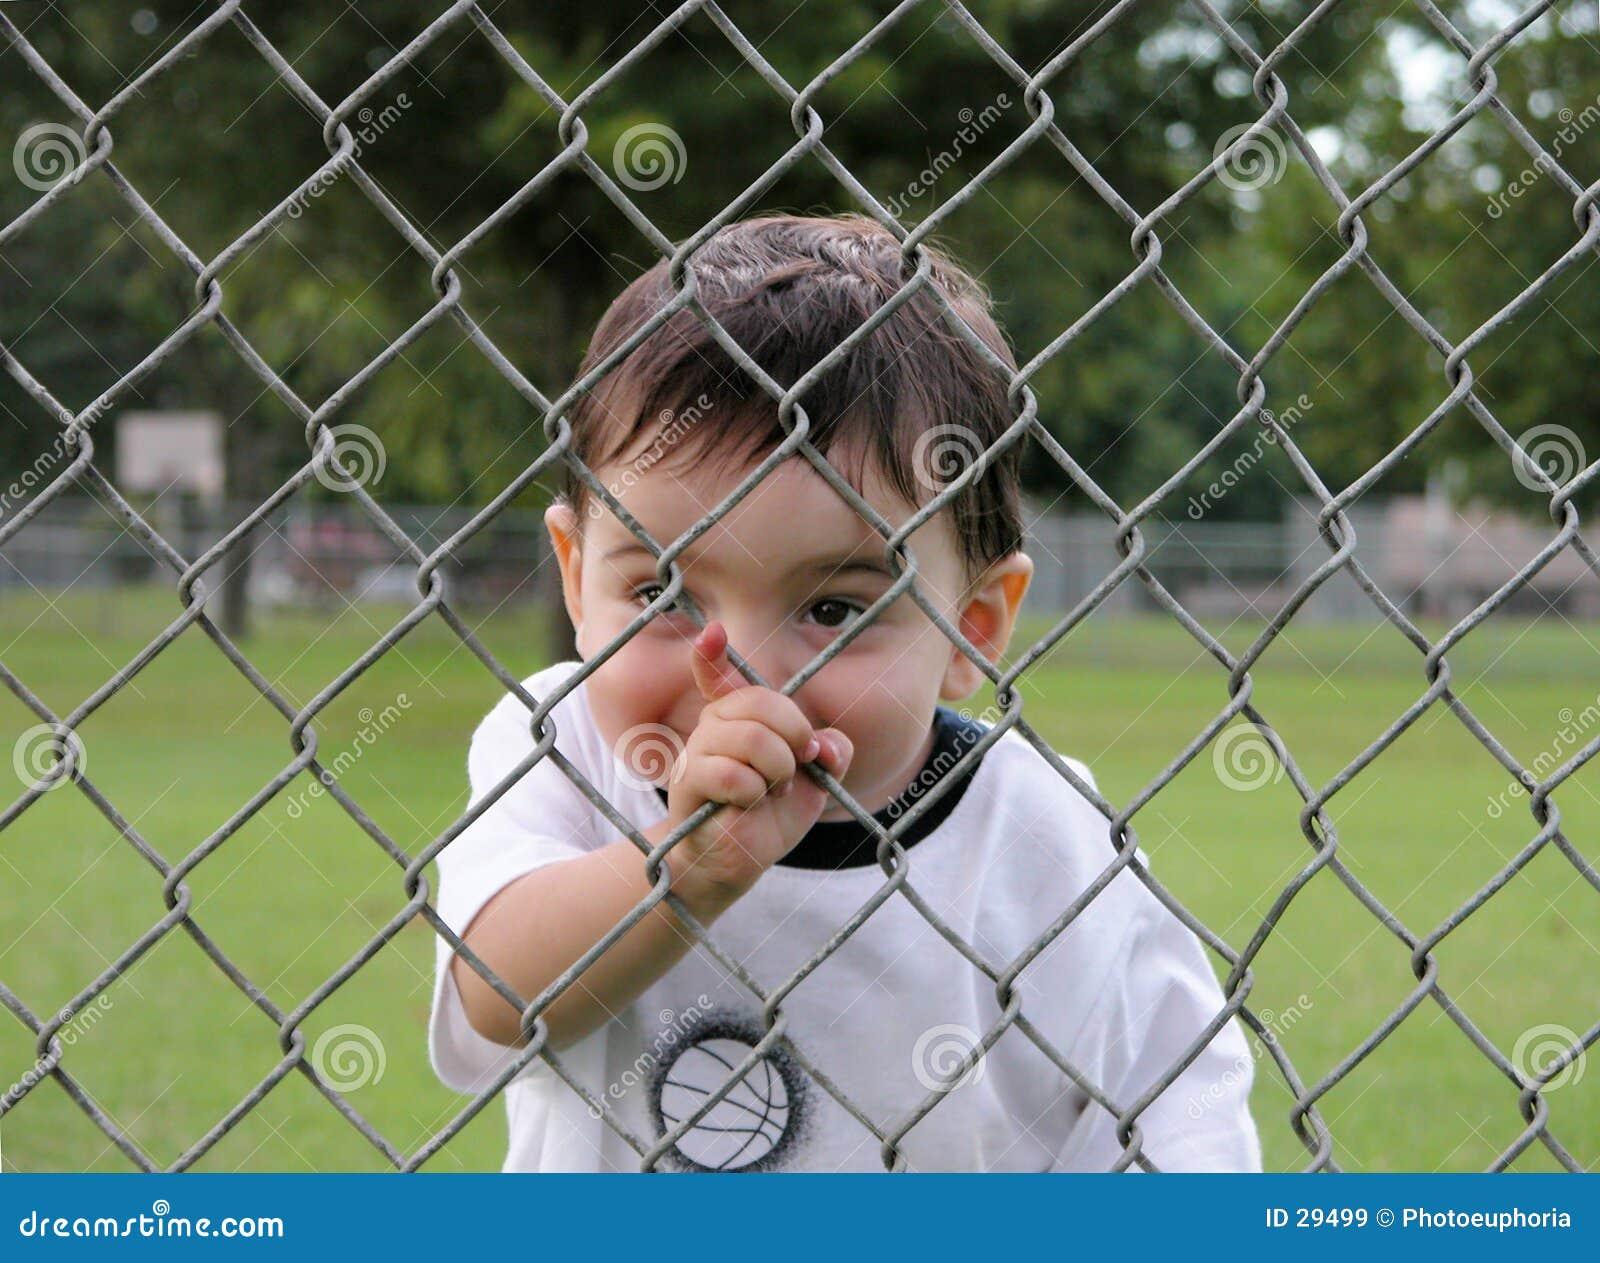 Children: Boy Peering Through Fence